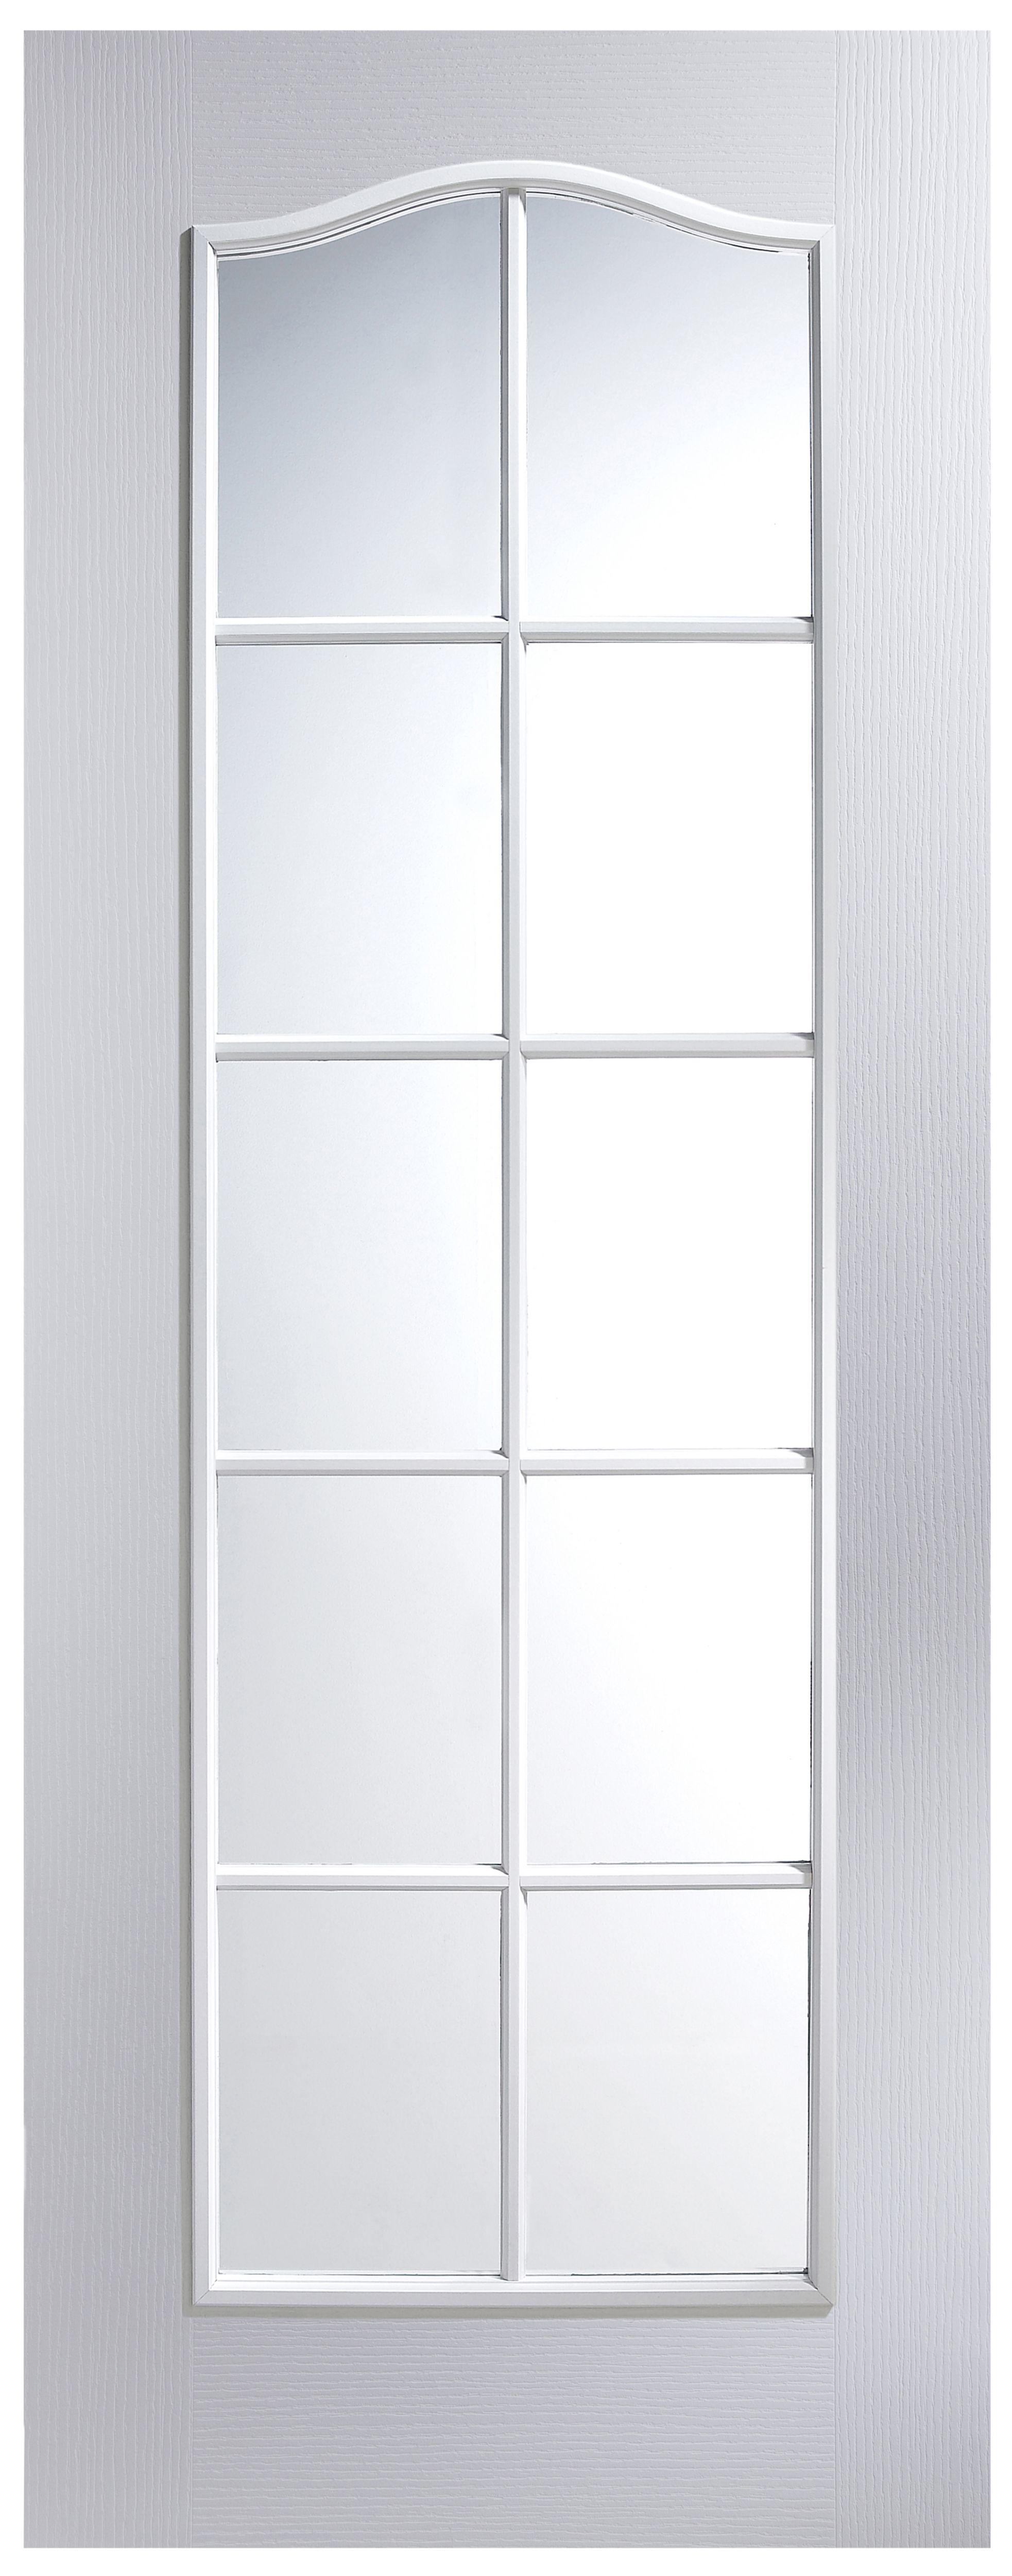 2 panel arched pre painted white woodgrain internal glazed. Black Bedroom Furniture Sets. Home Design Ideas